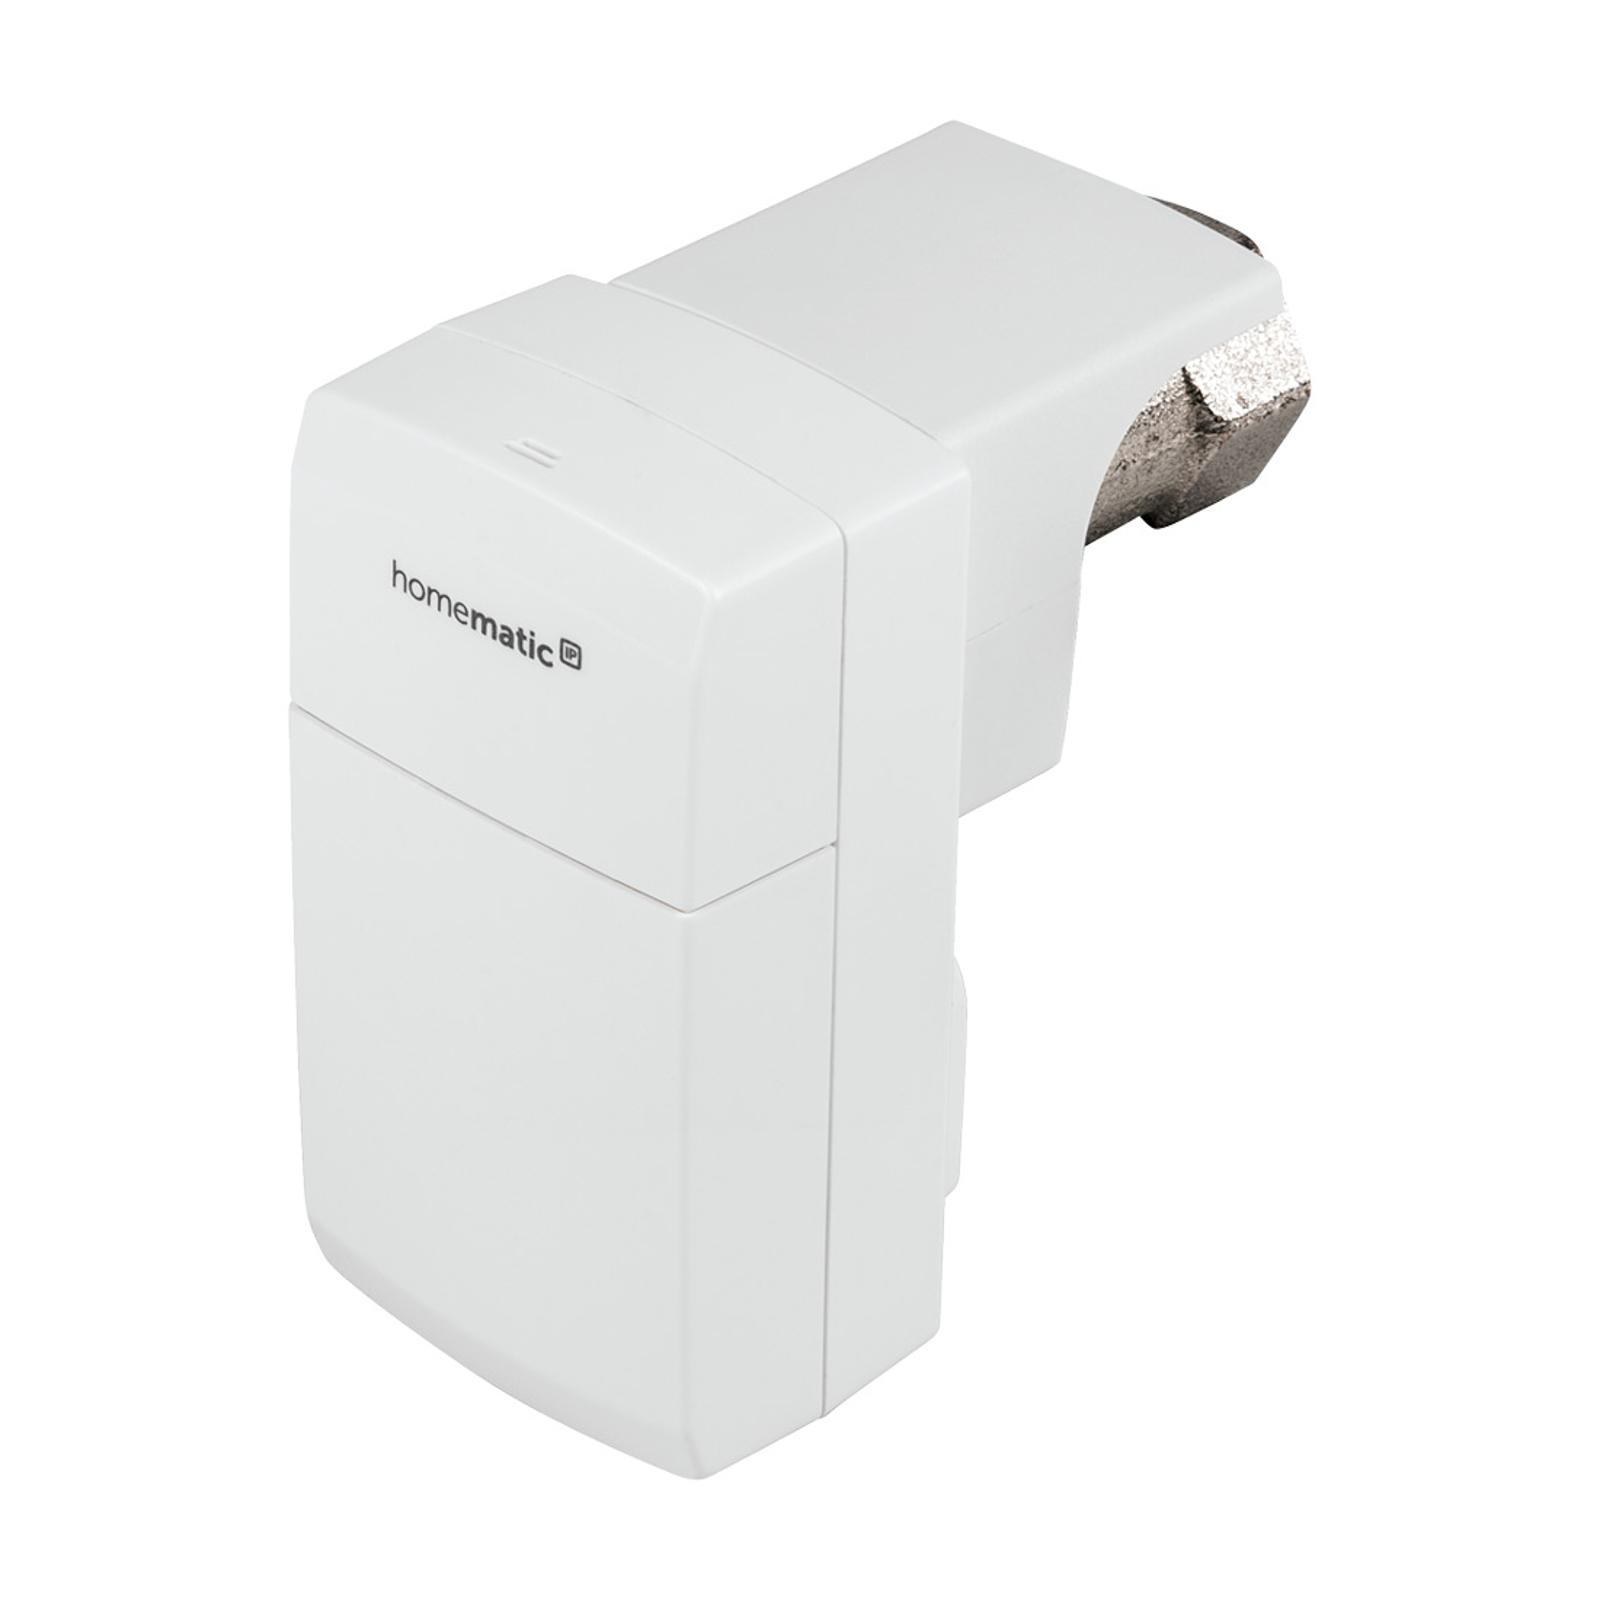 Homematic IP-demovern termostat, kompakt 5x